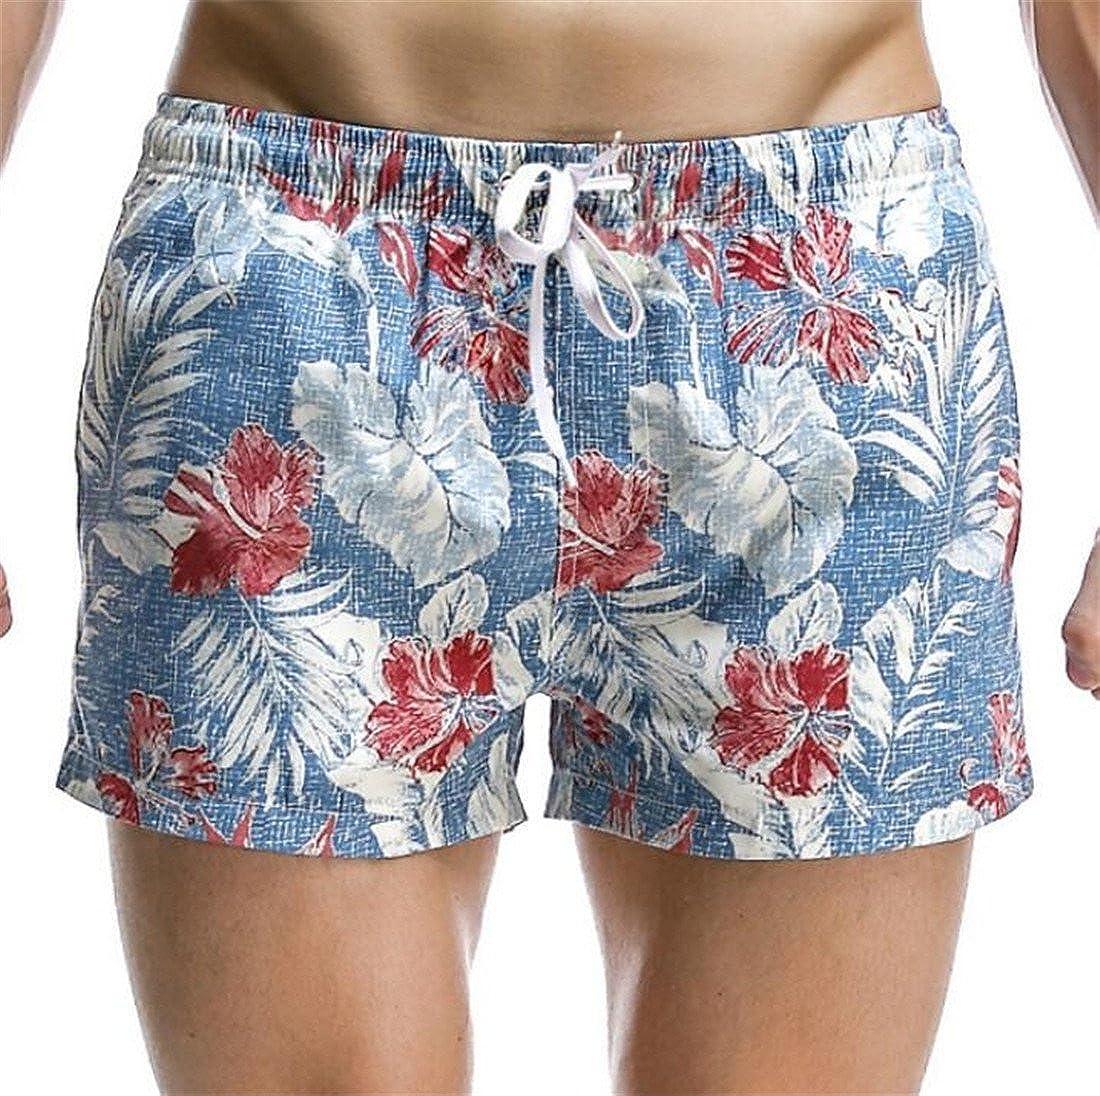 UUYUK Men Quick Dry Printed Short Swim Trunks Swimwear Bathing Suits